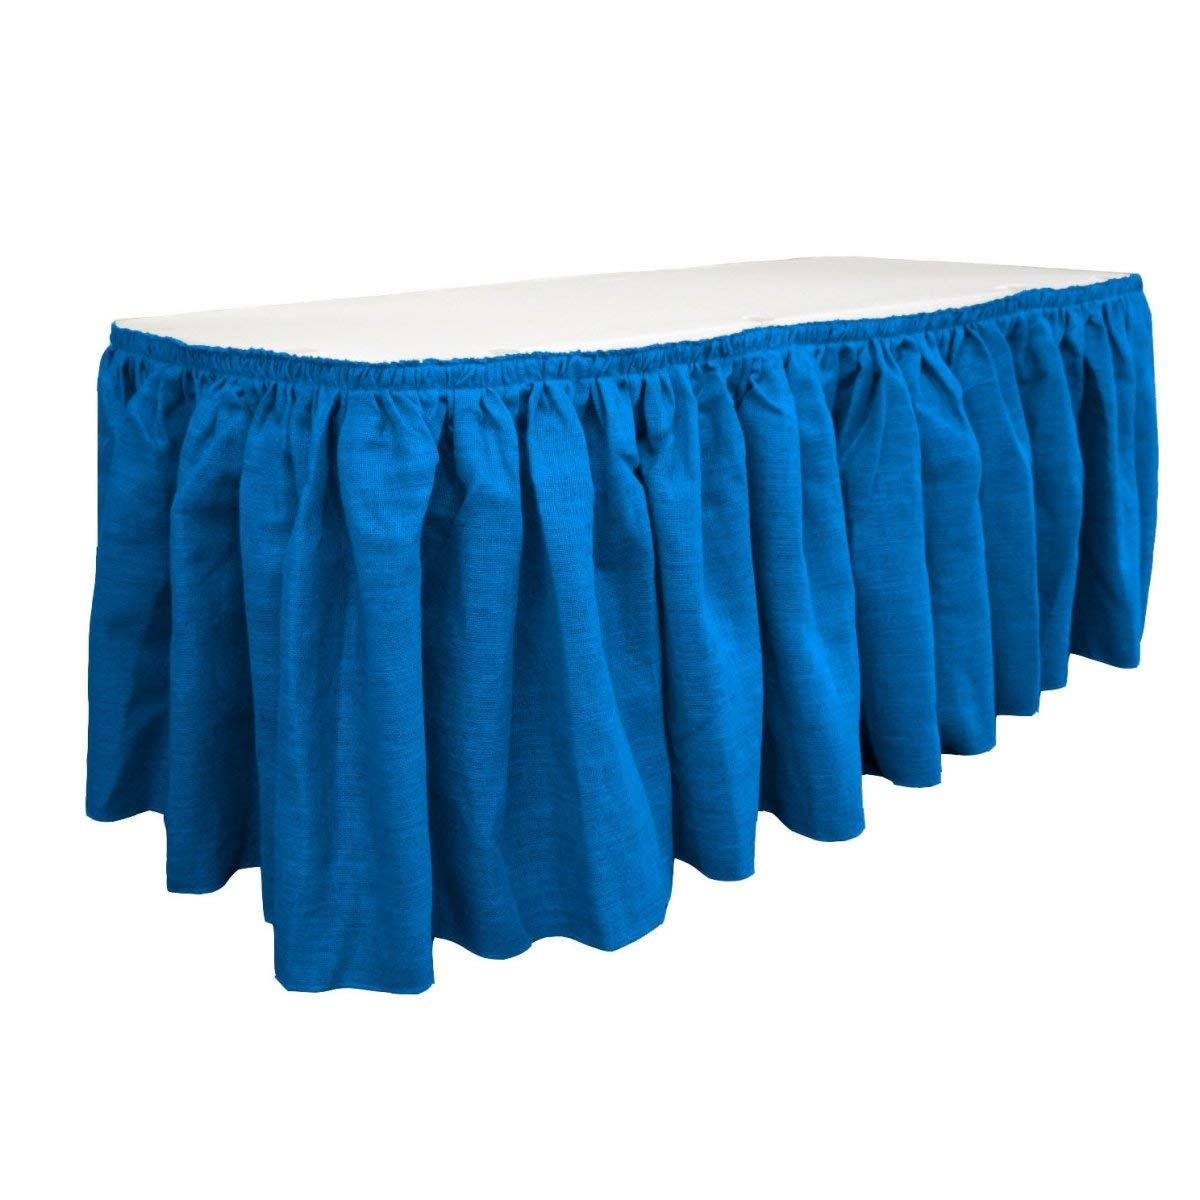 LA Linen SkirtBurlap17x29-10Lclips-BlueRoyal Burlap Table Skirt with 10 L-Clips44; Royal Blue - 17 ft. x 29 in.